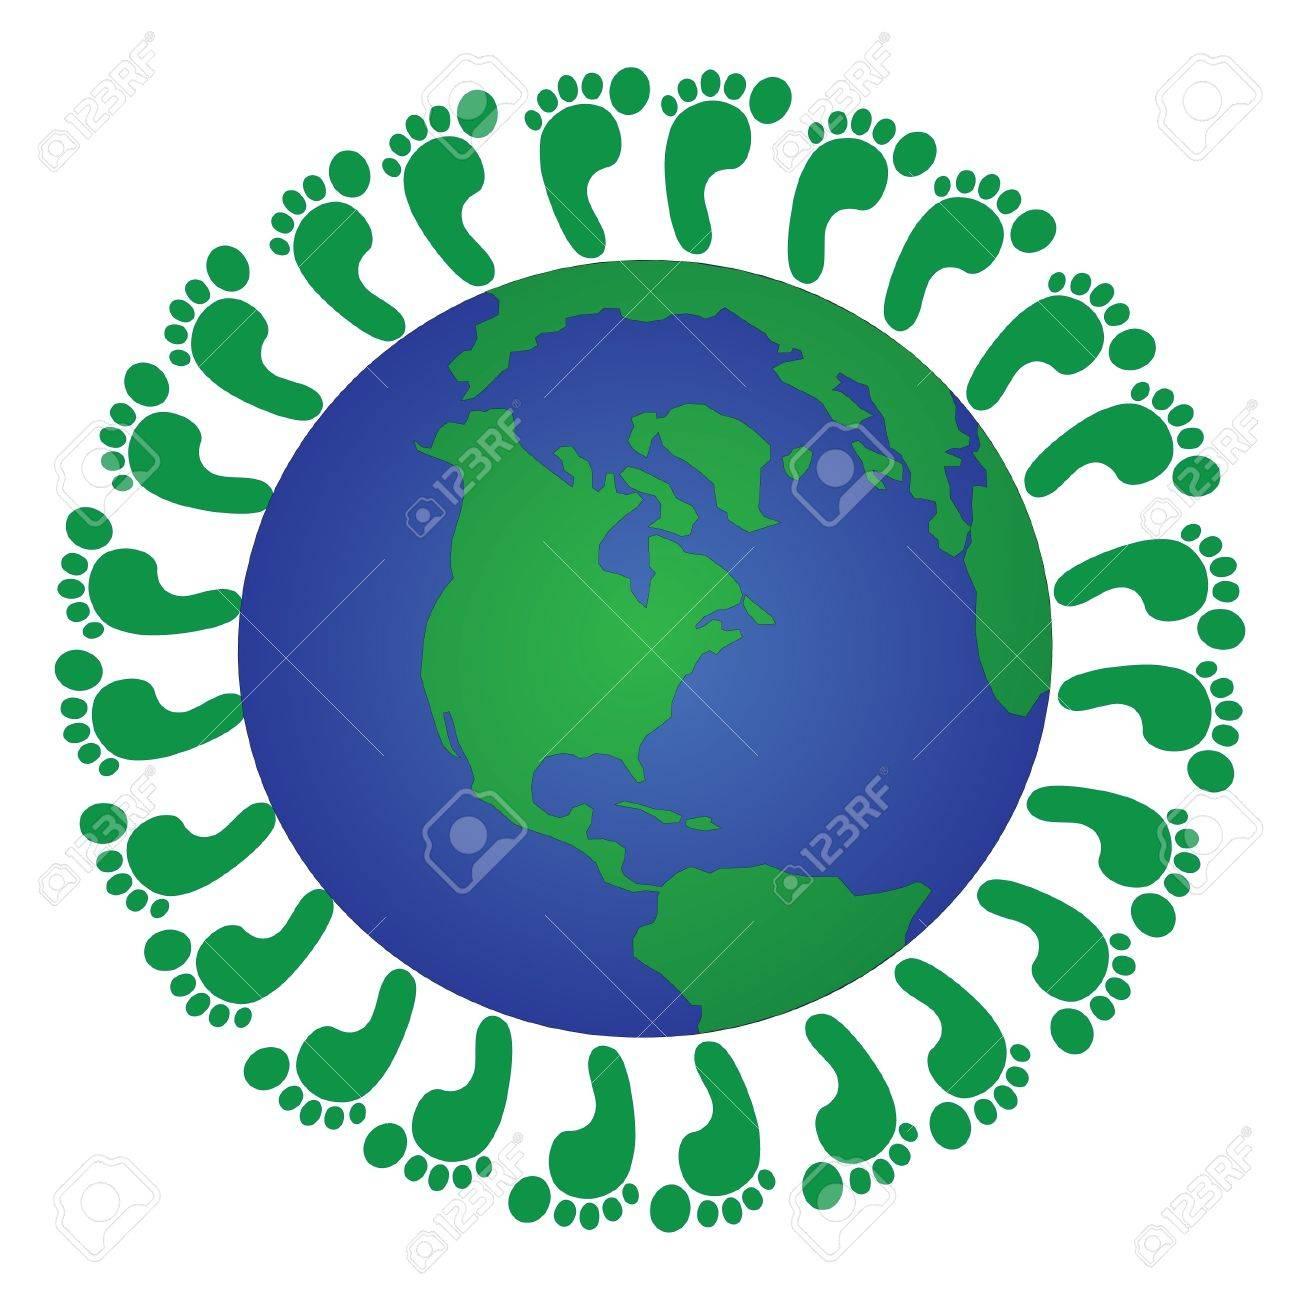 Global footprints Stock Vector - 13185116